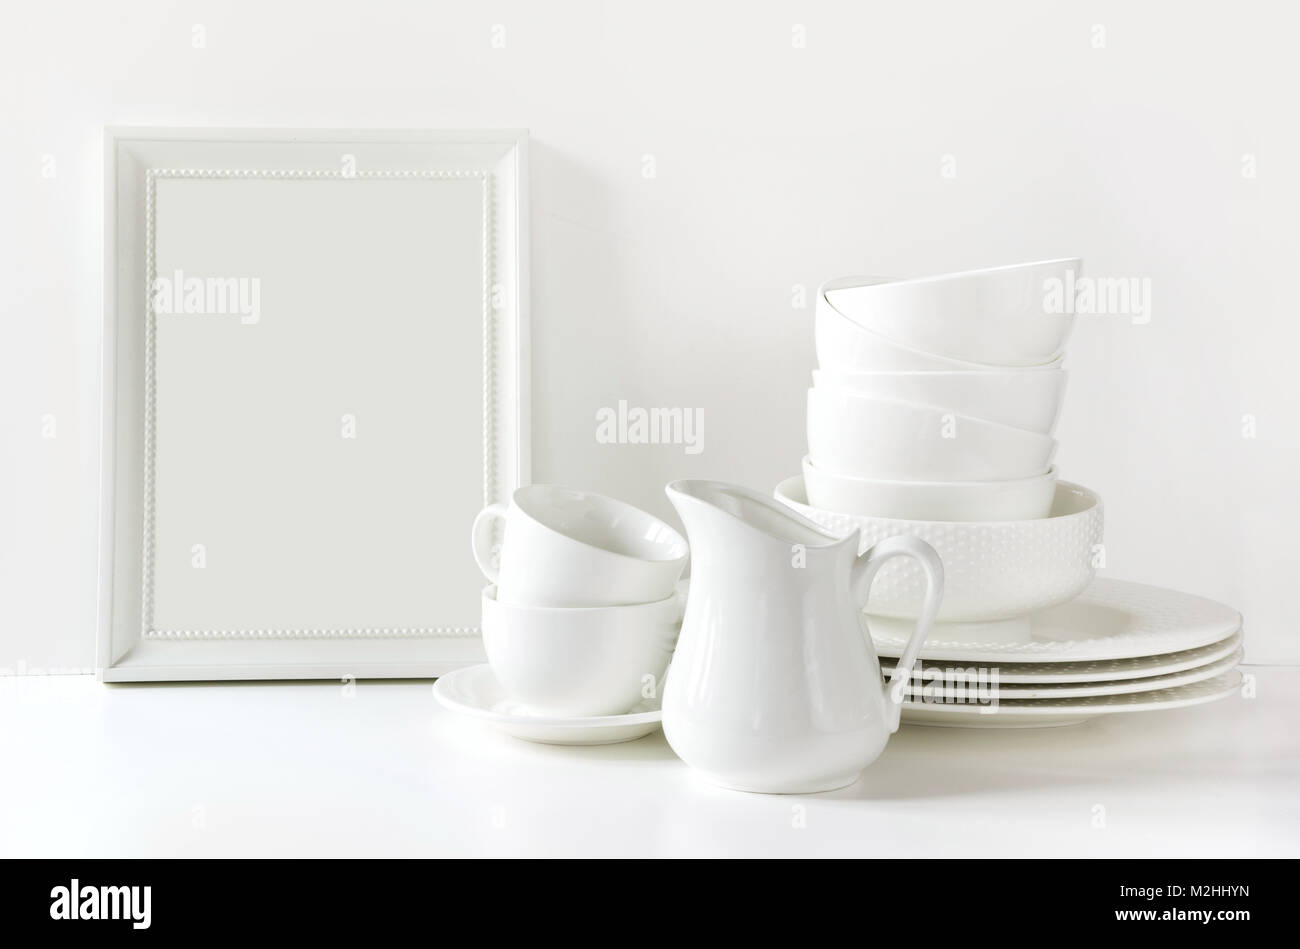 Beautiful Oggetti Per Cucina Pictures - Lepicentre.info - lepicentre ...